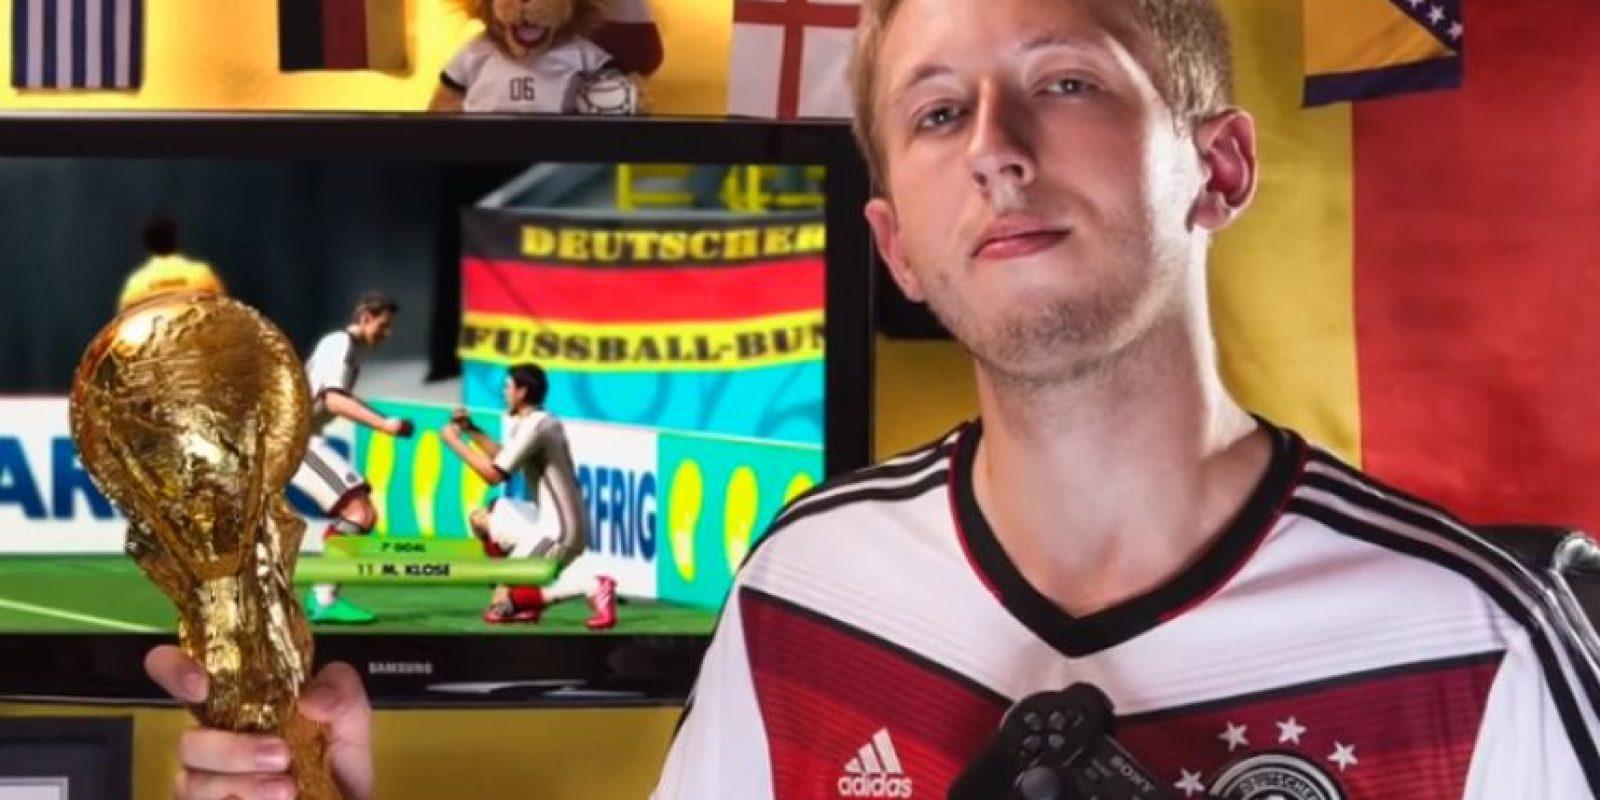 Se trata del alemán Patrick Hadler Foto:Youtube: Guinness World Records